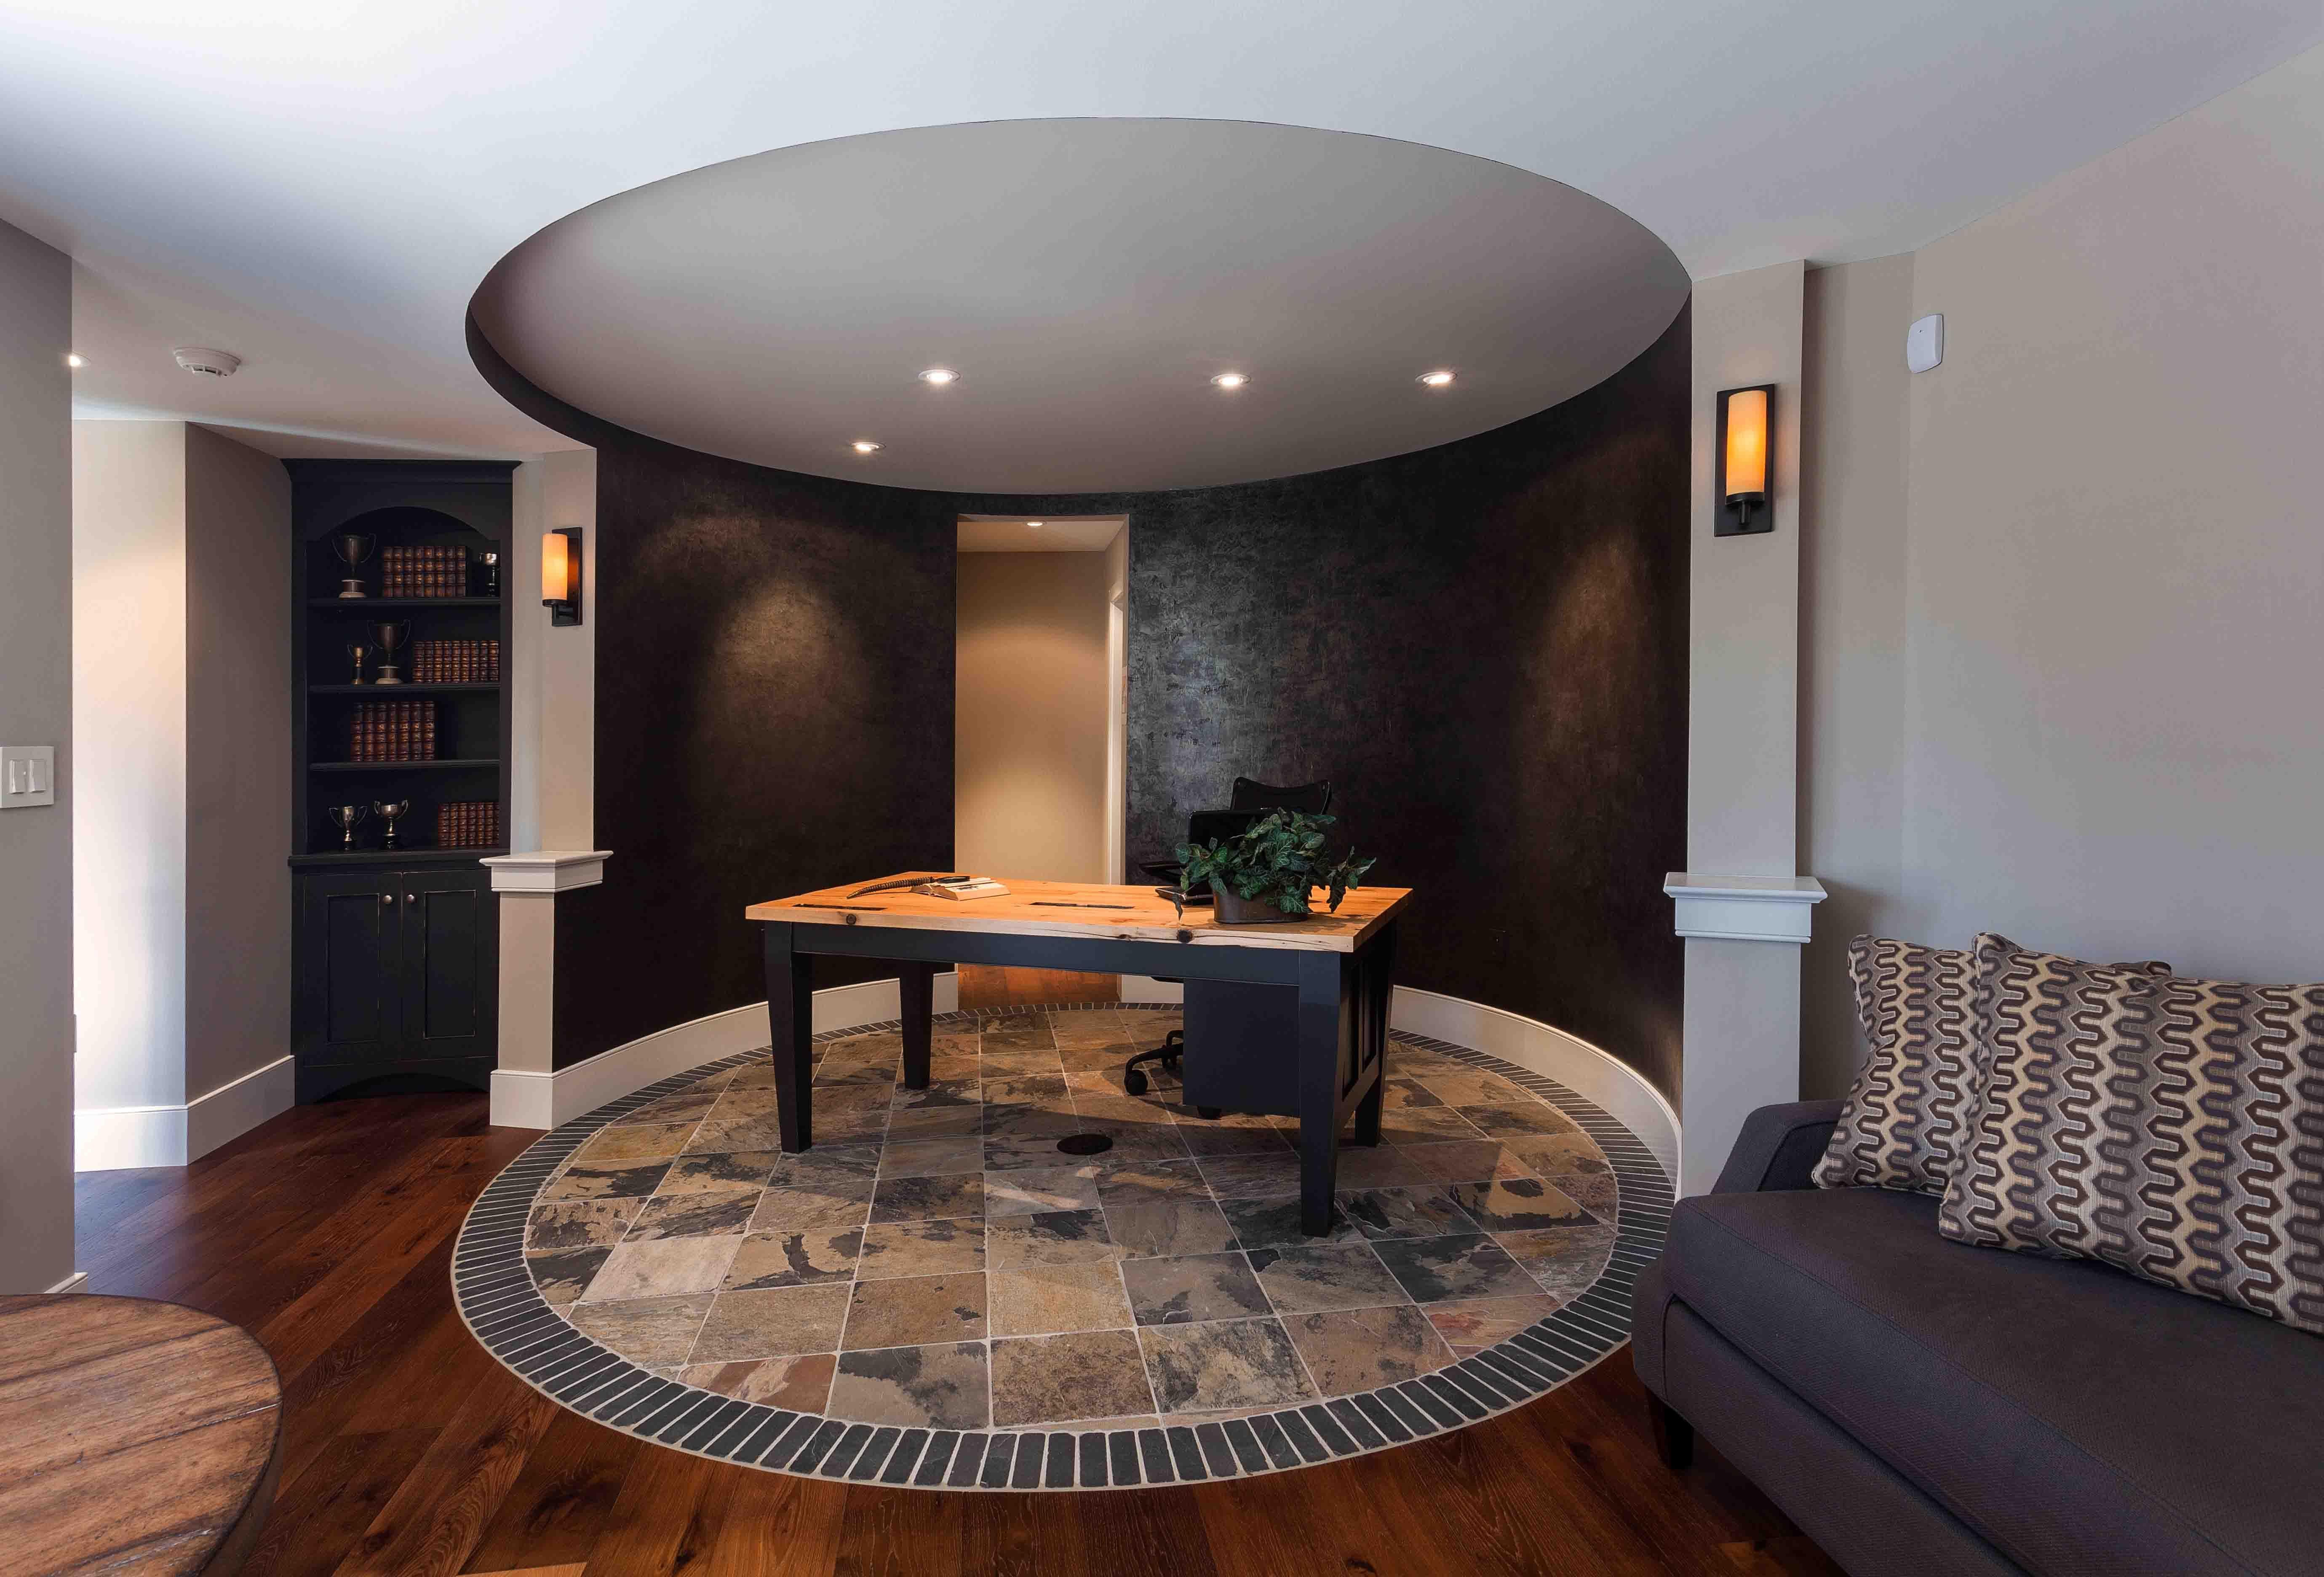 Parade Home 2012 Designed By Michael Shank Http Www Interiors Furniture Com Interior Furniture Furniture